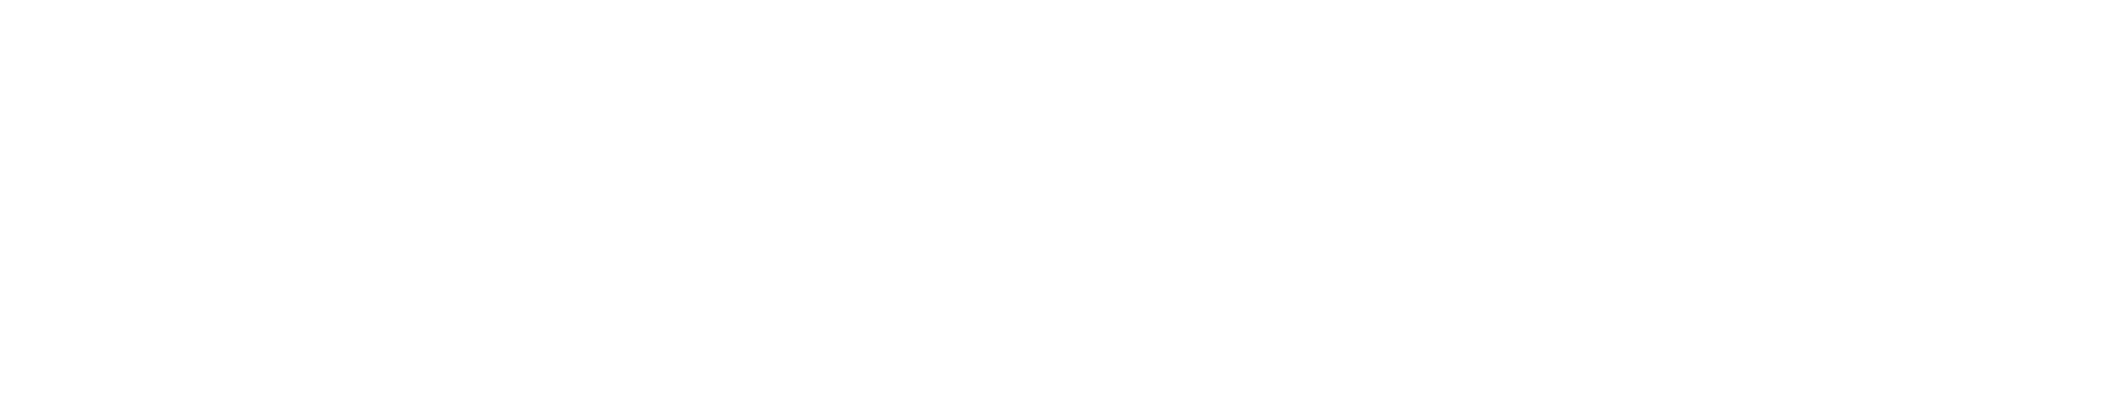 continuite-service-icone